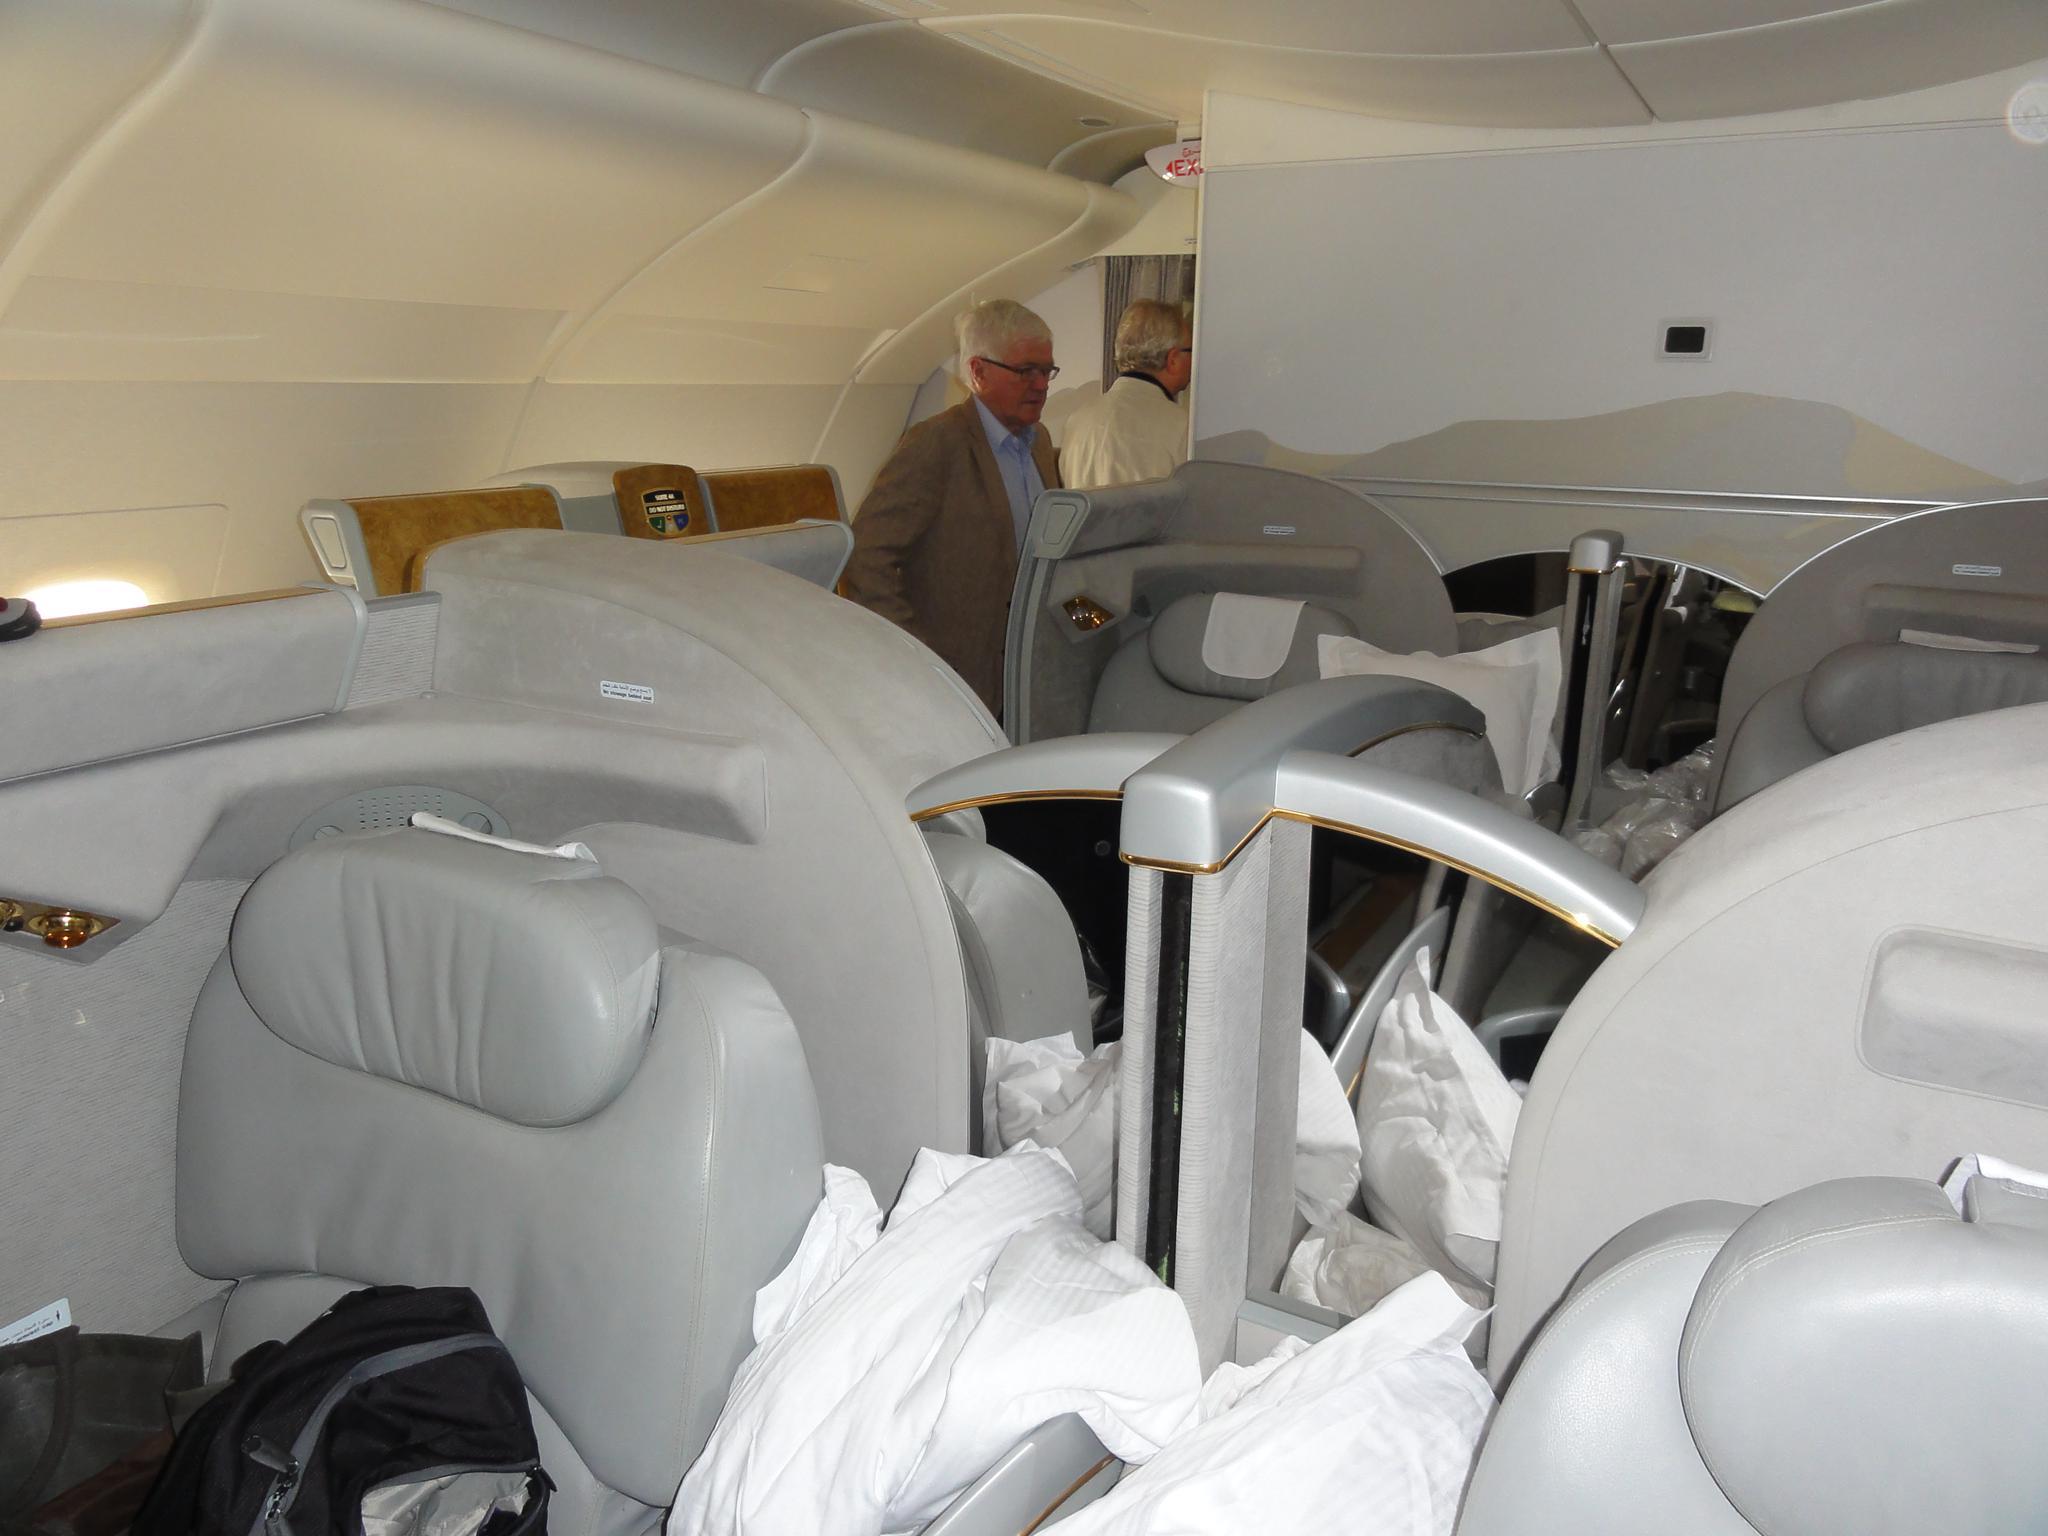 Emirates A380, First Class private Suiten